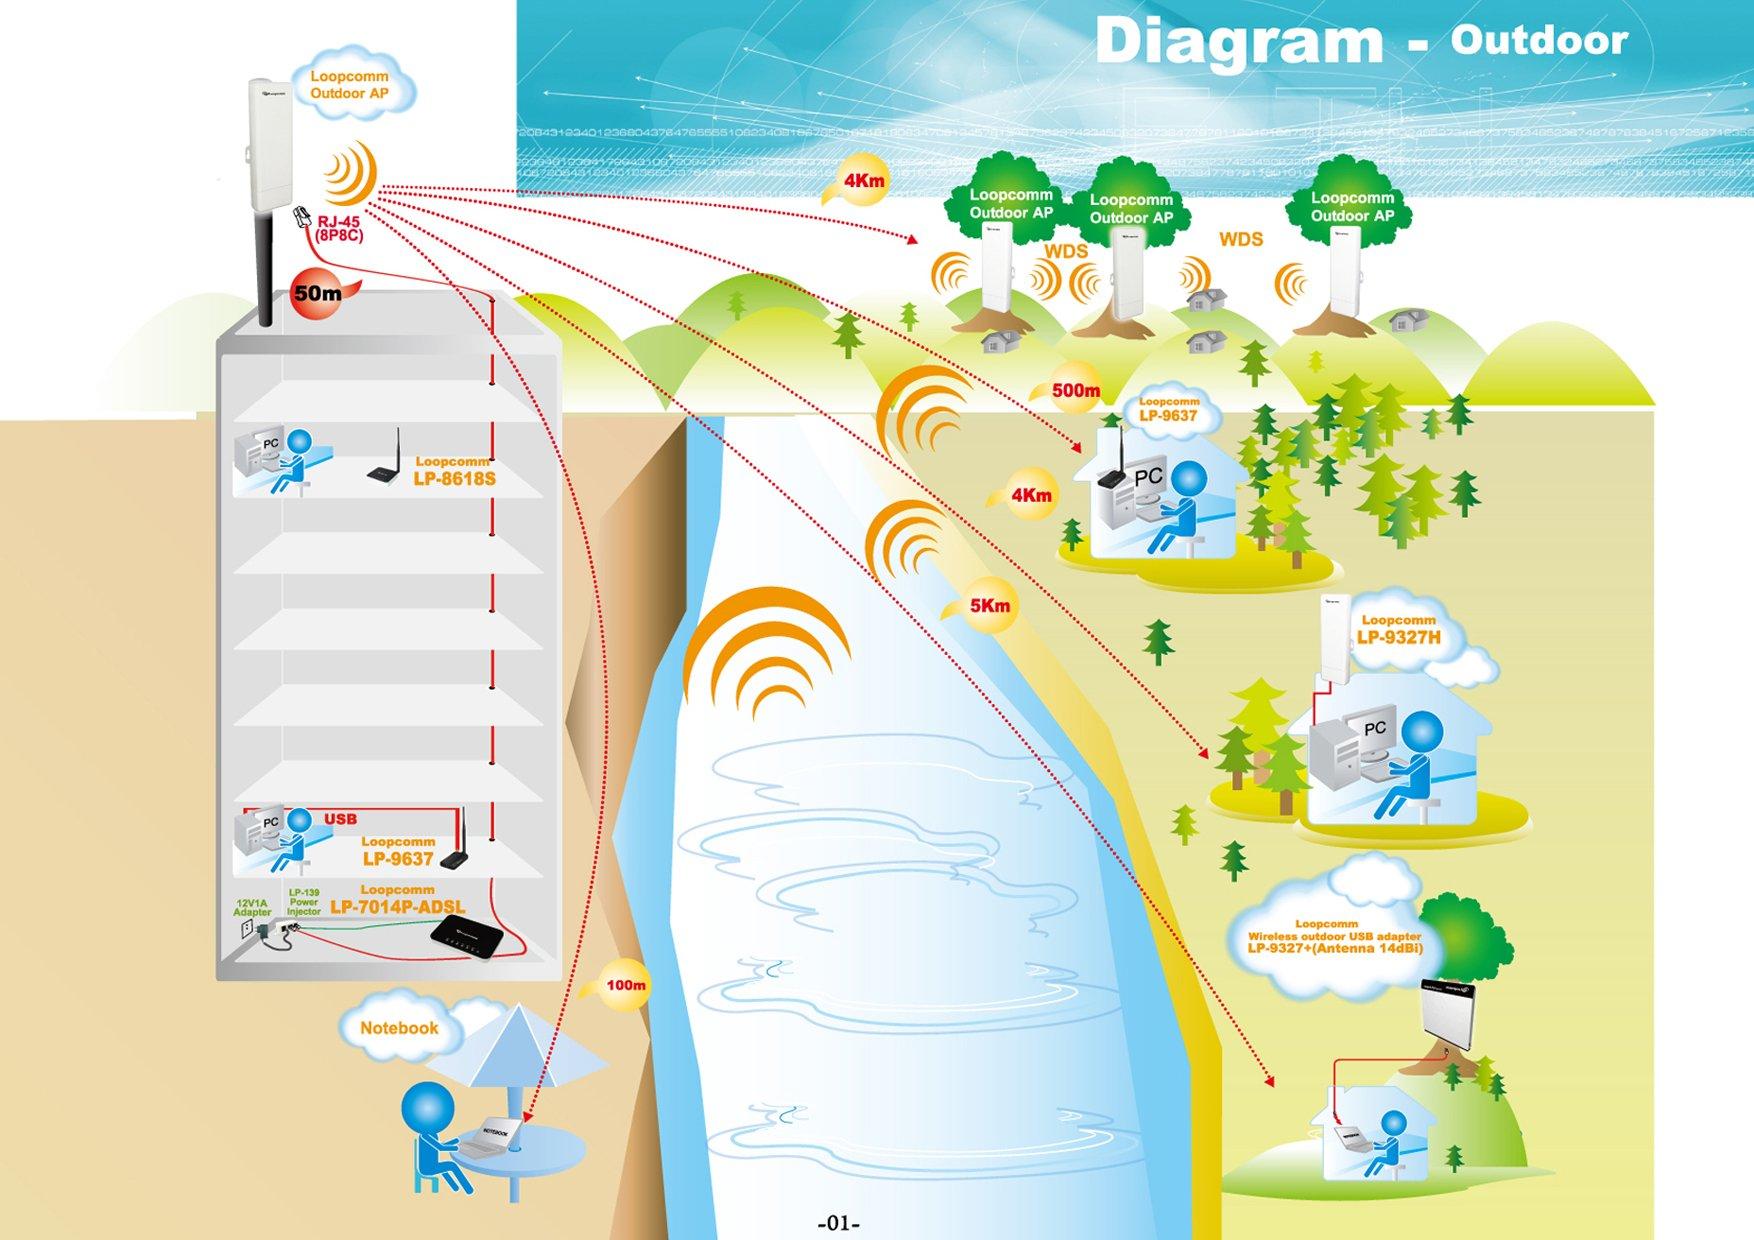 Loopcomm Outdoor 802.11b/g/n Wireless High Power CPE/AP/Router/Clint/Bridge/Repeater (LP-7316K) by Loopcomm (Image #5)